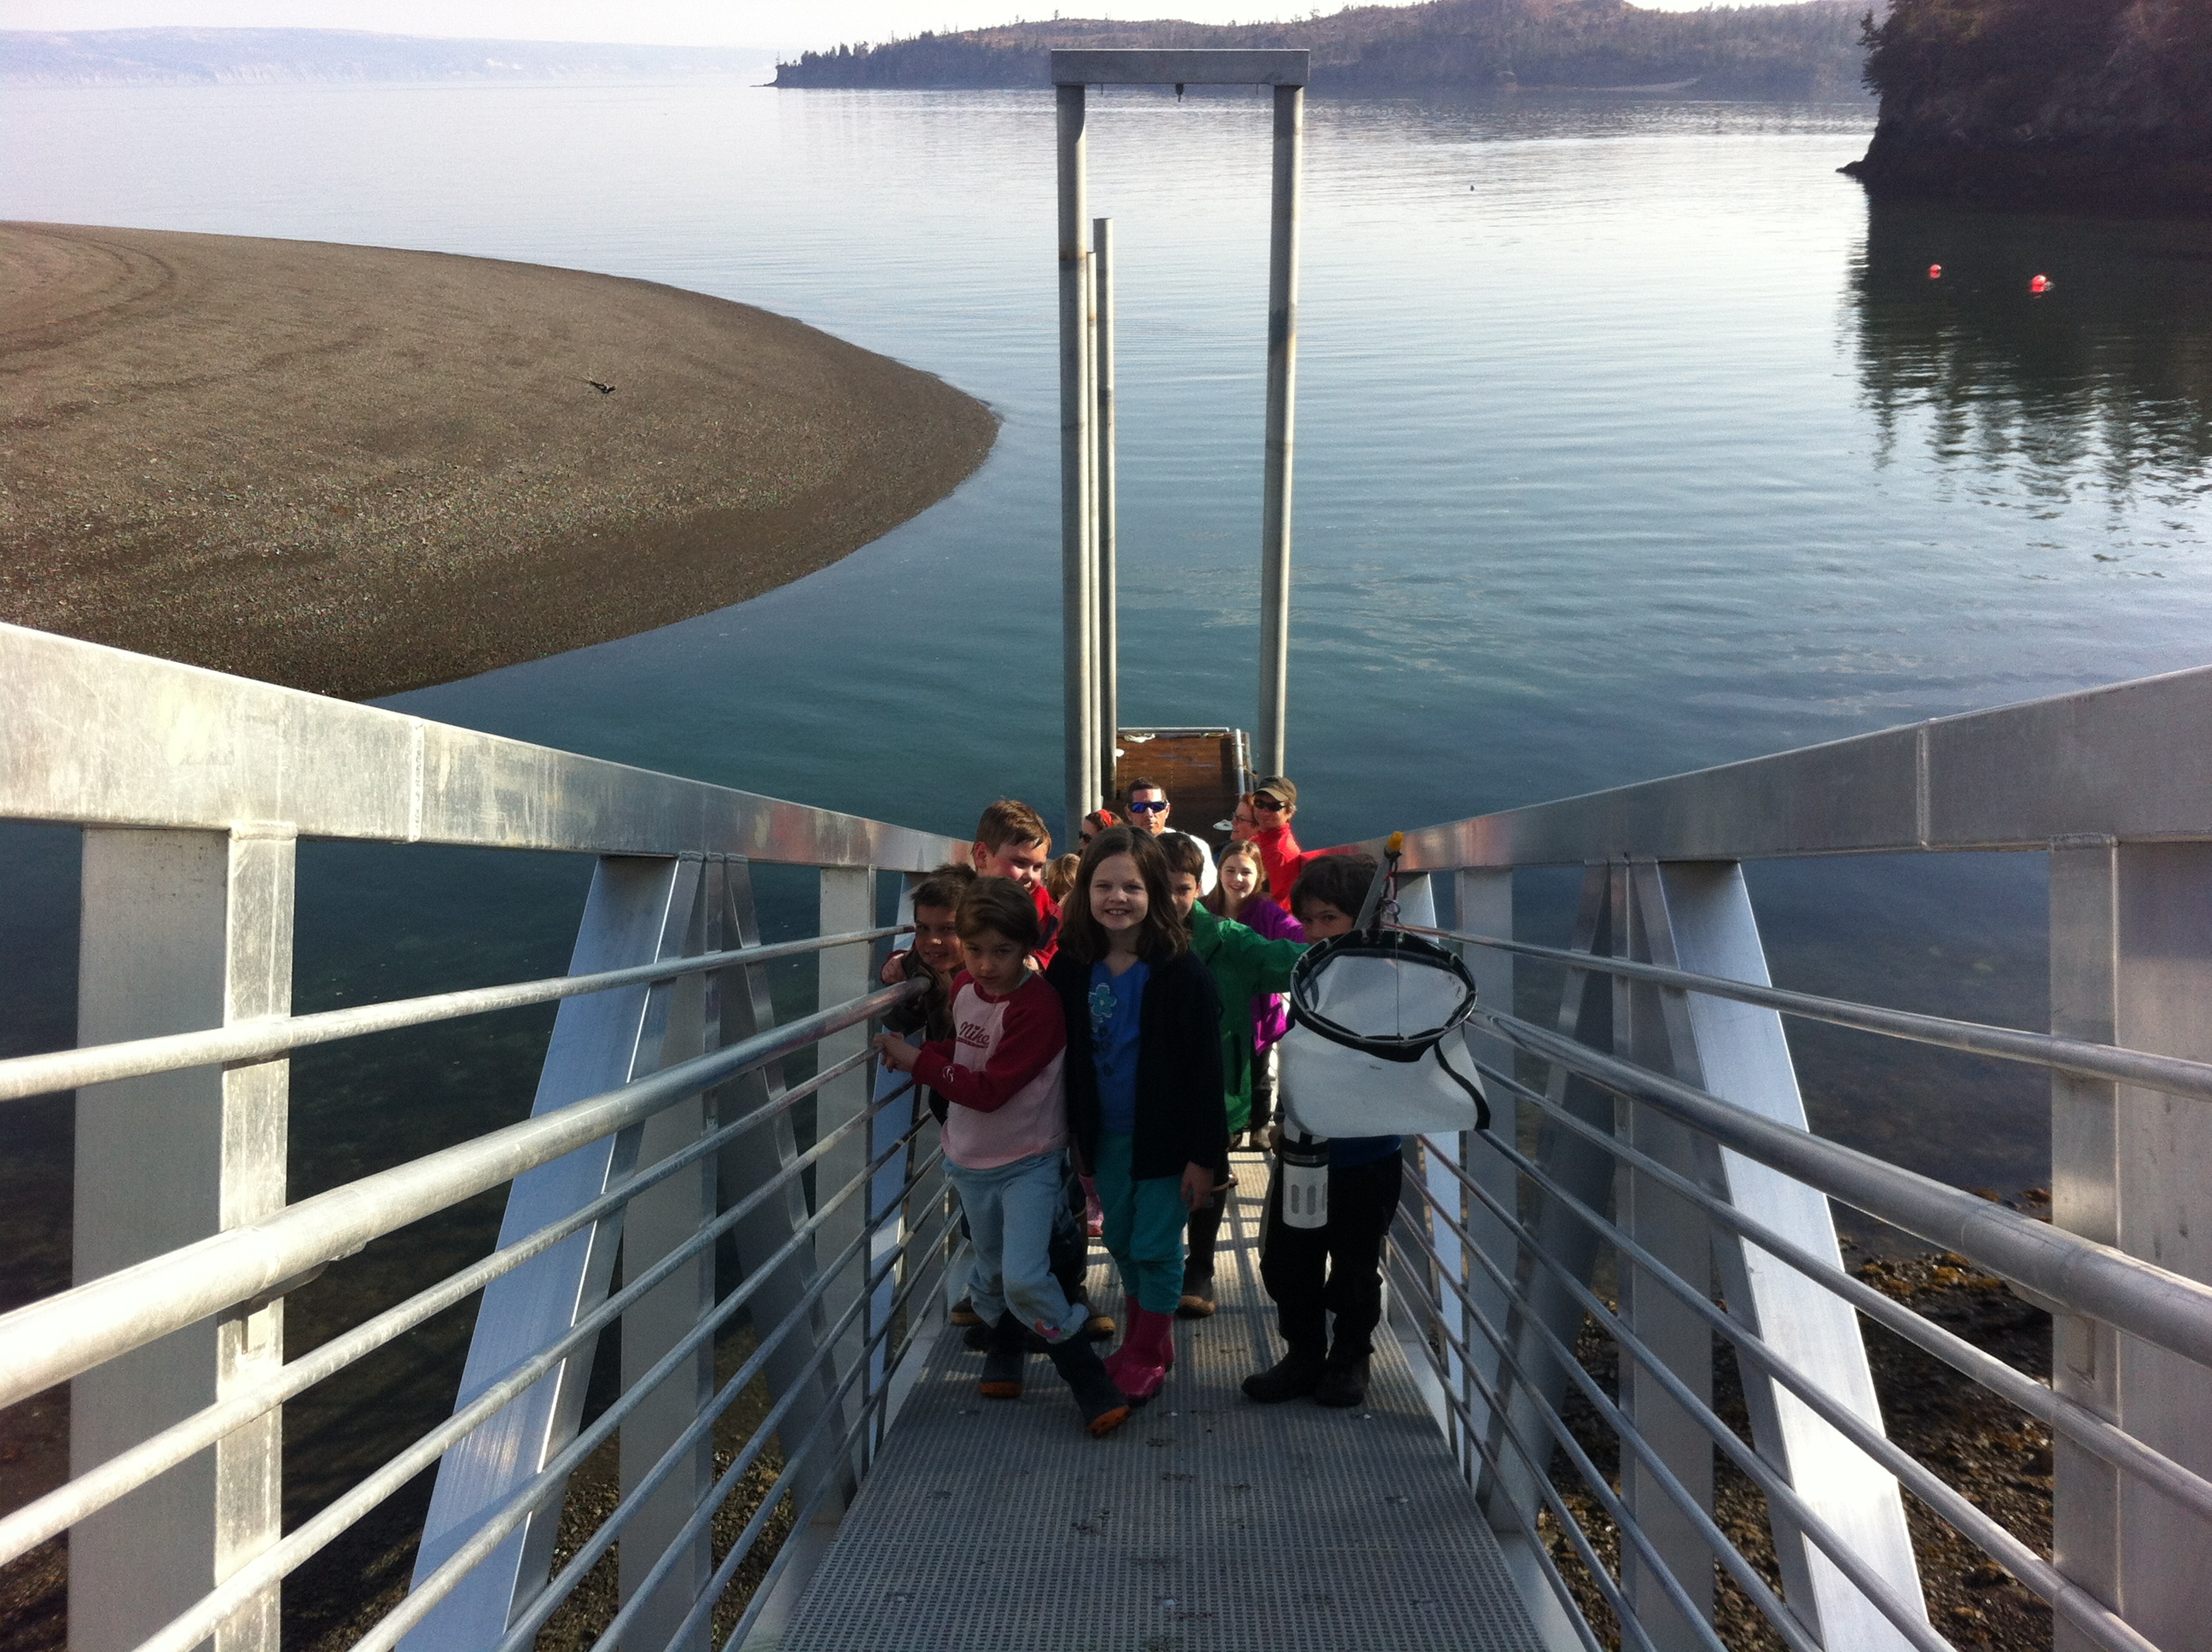 Center for Alaskan Coastal Studies